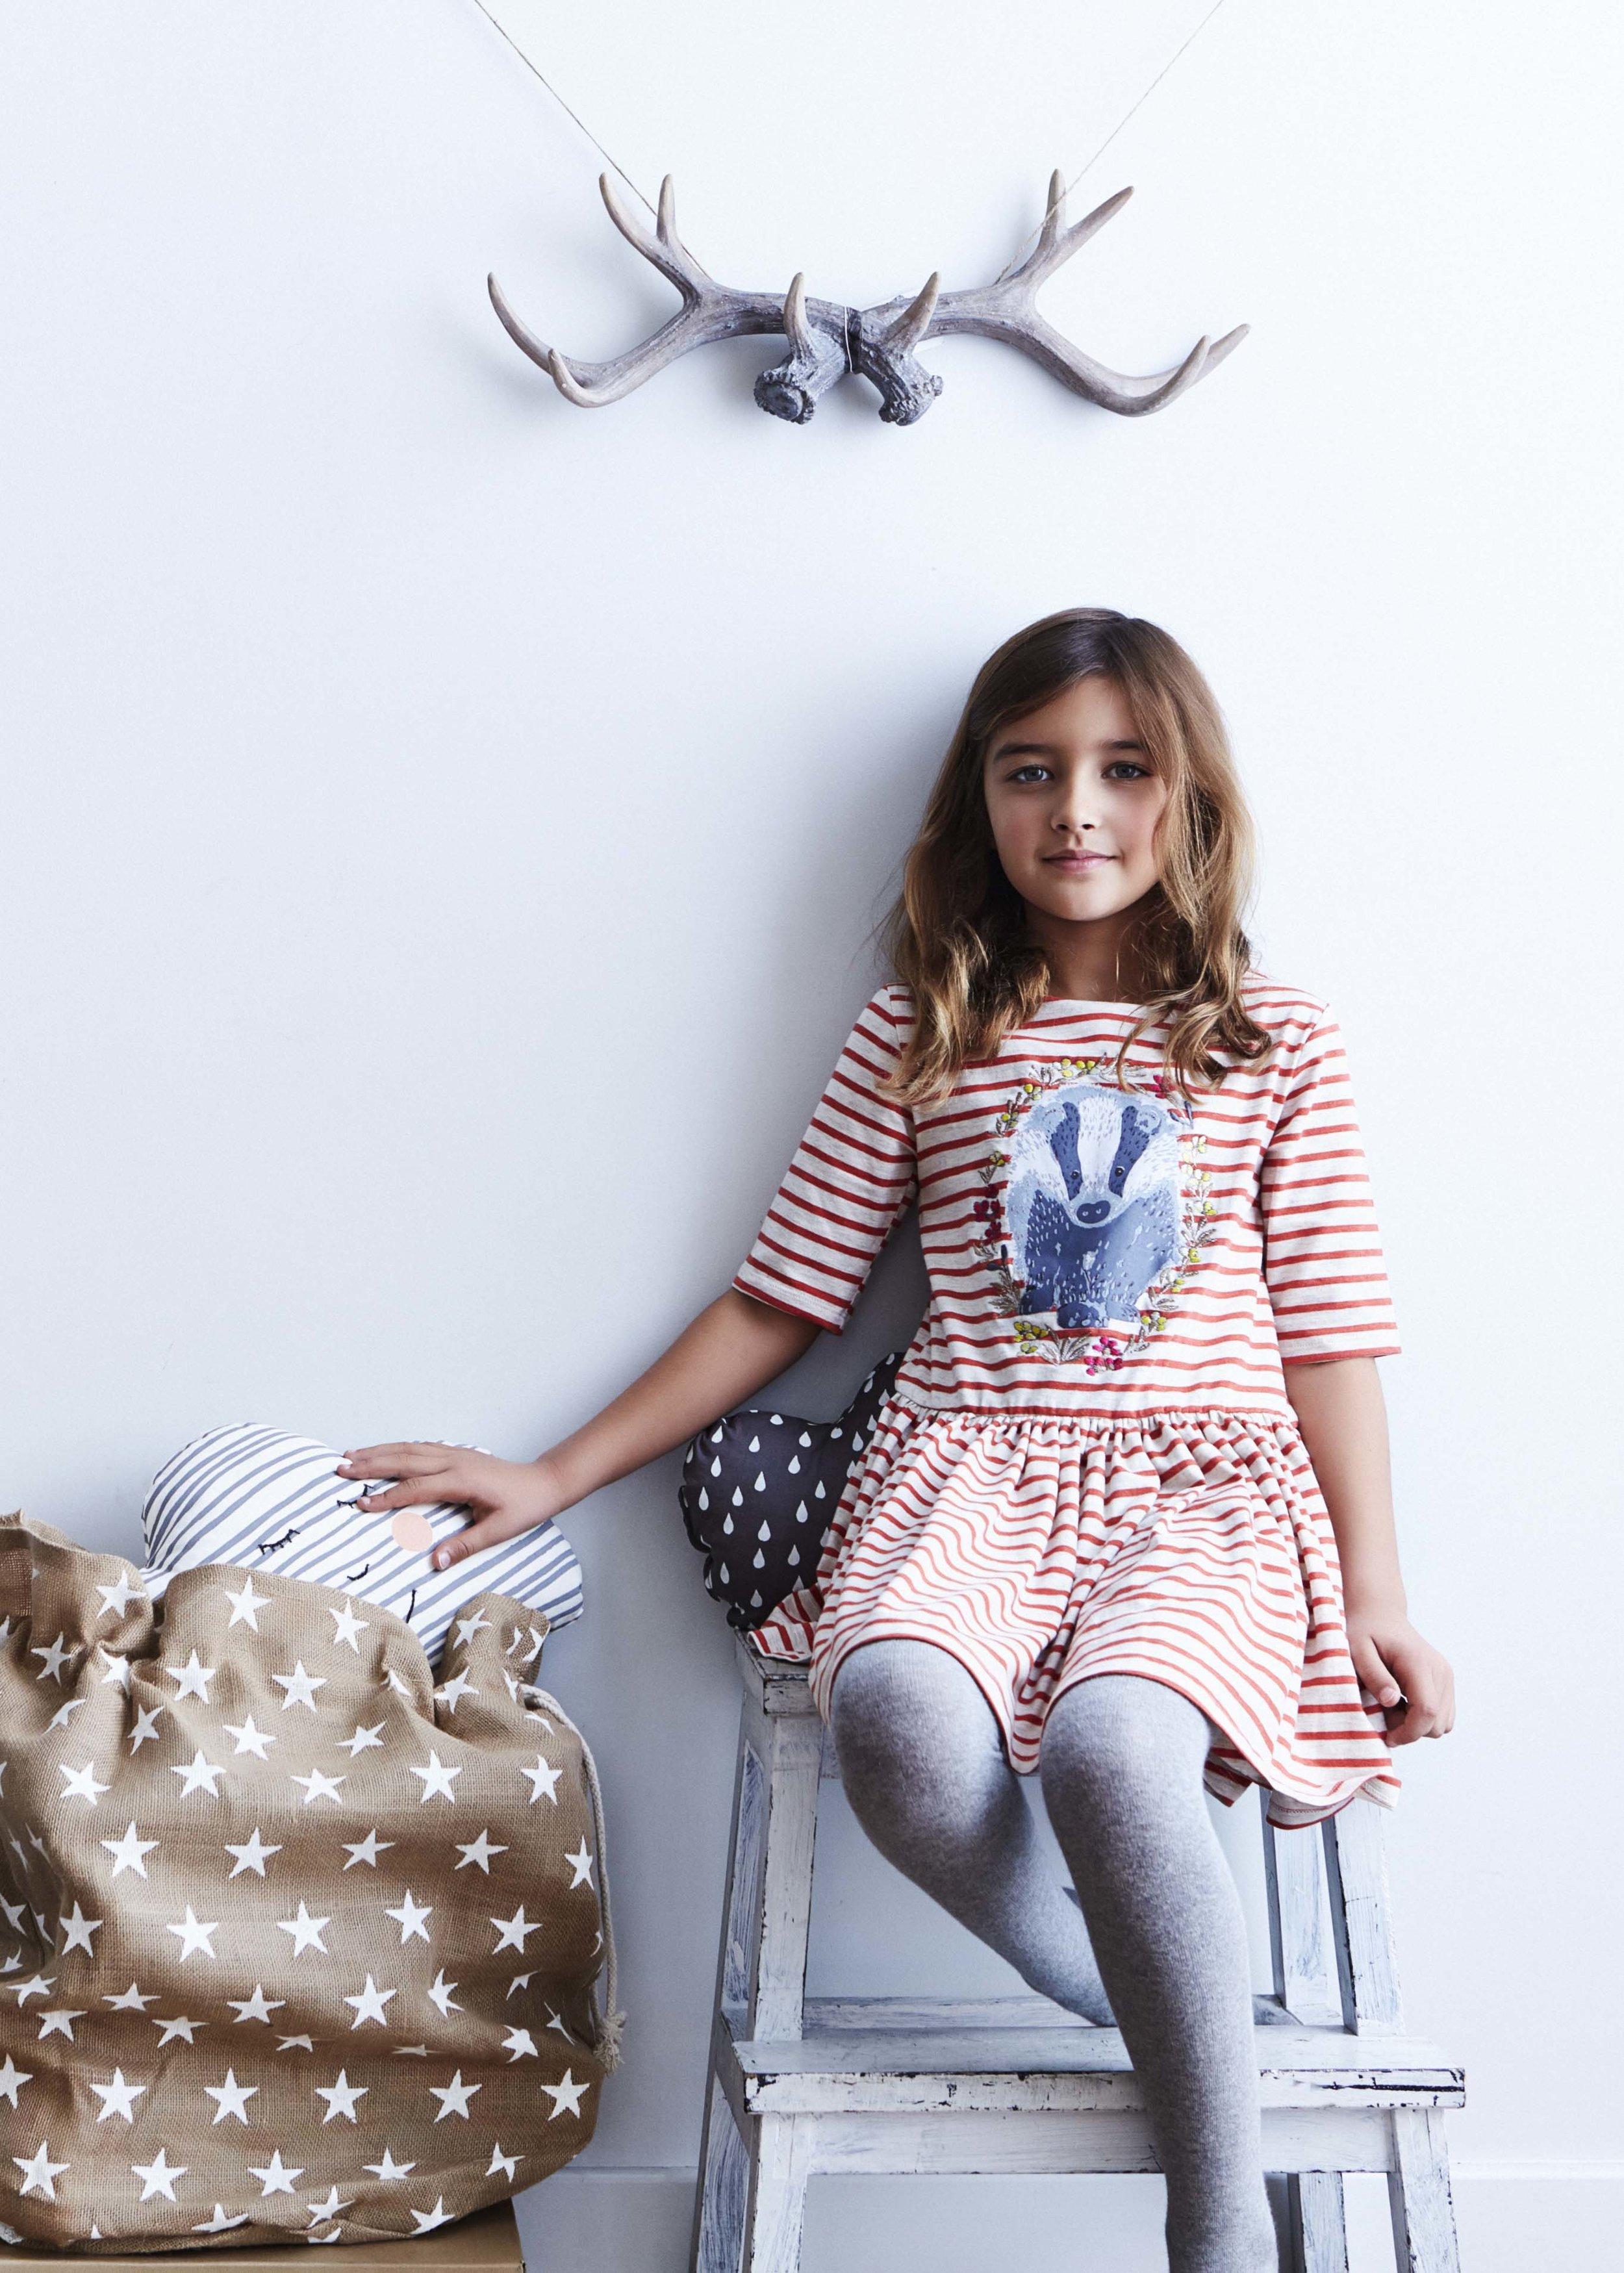 Liz_Cooper_Interior_Stylist_Styling_Kids_christmas.jpg